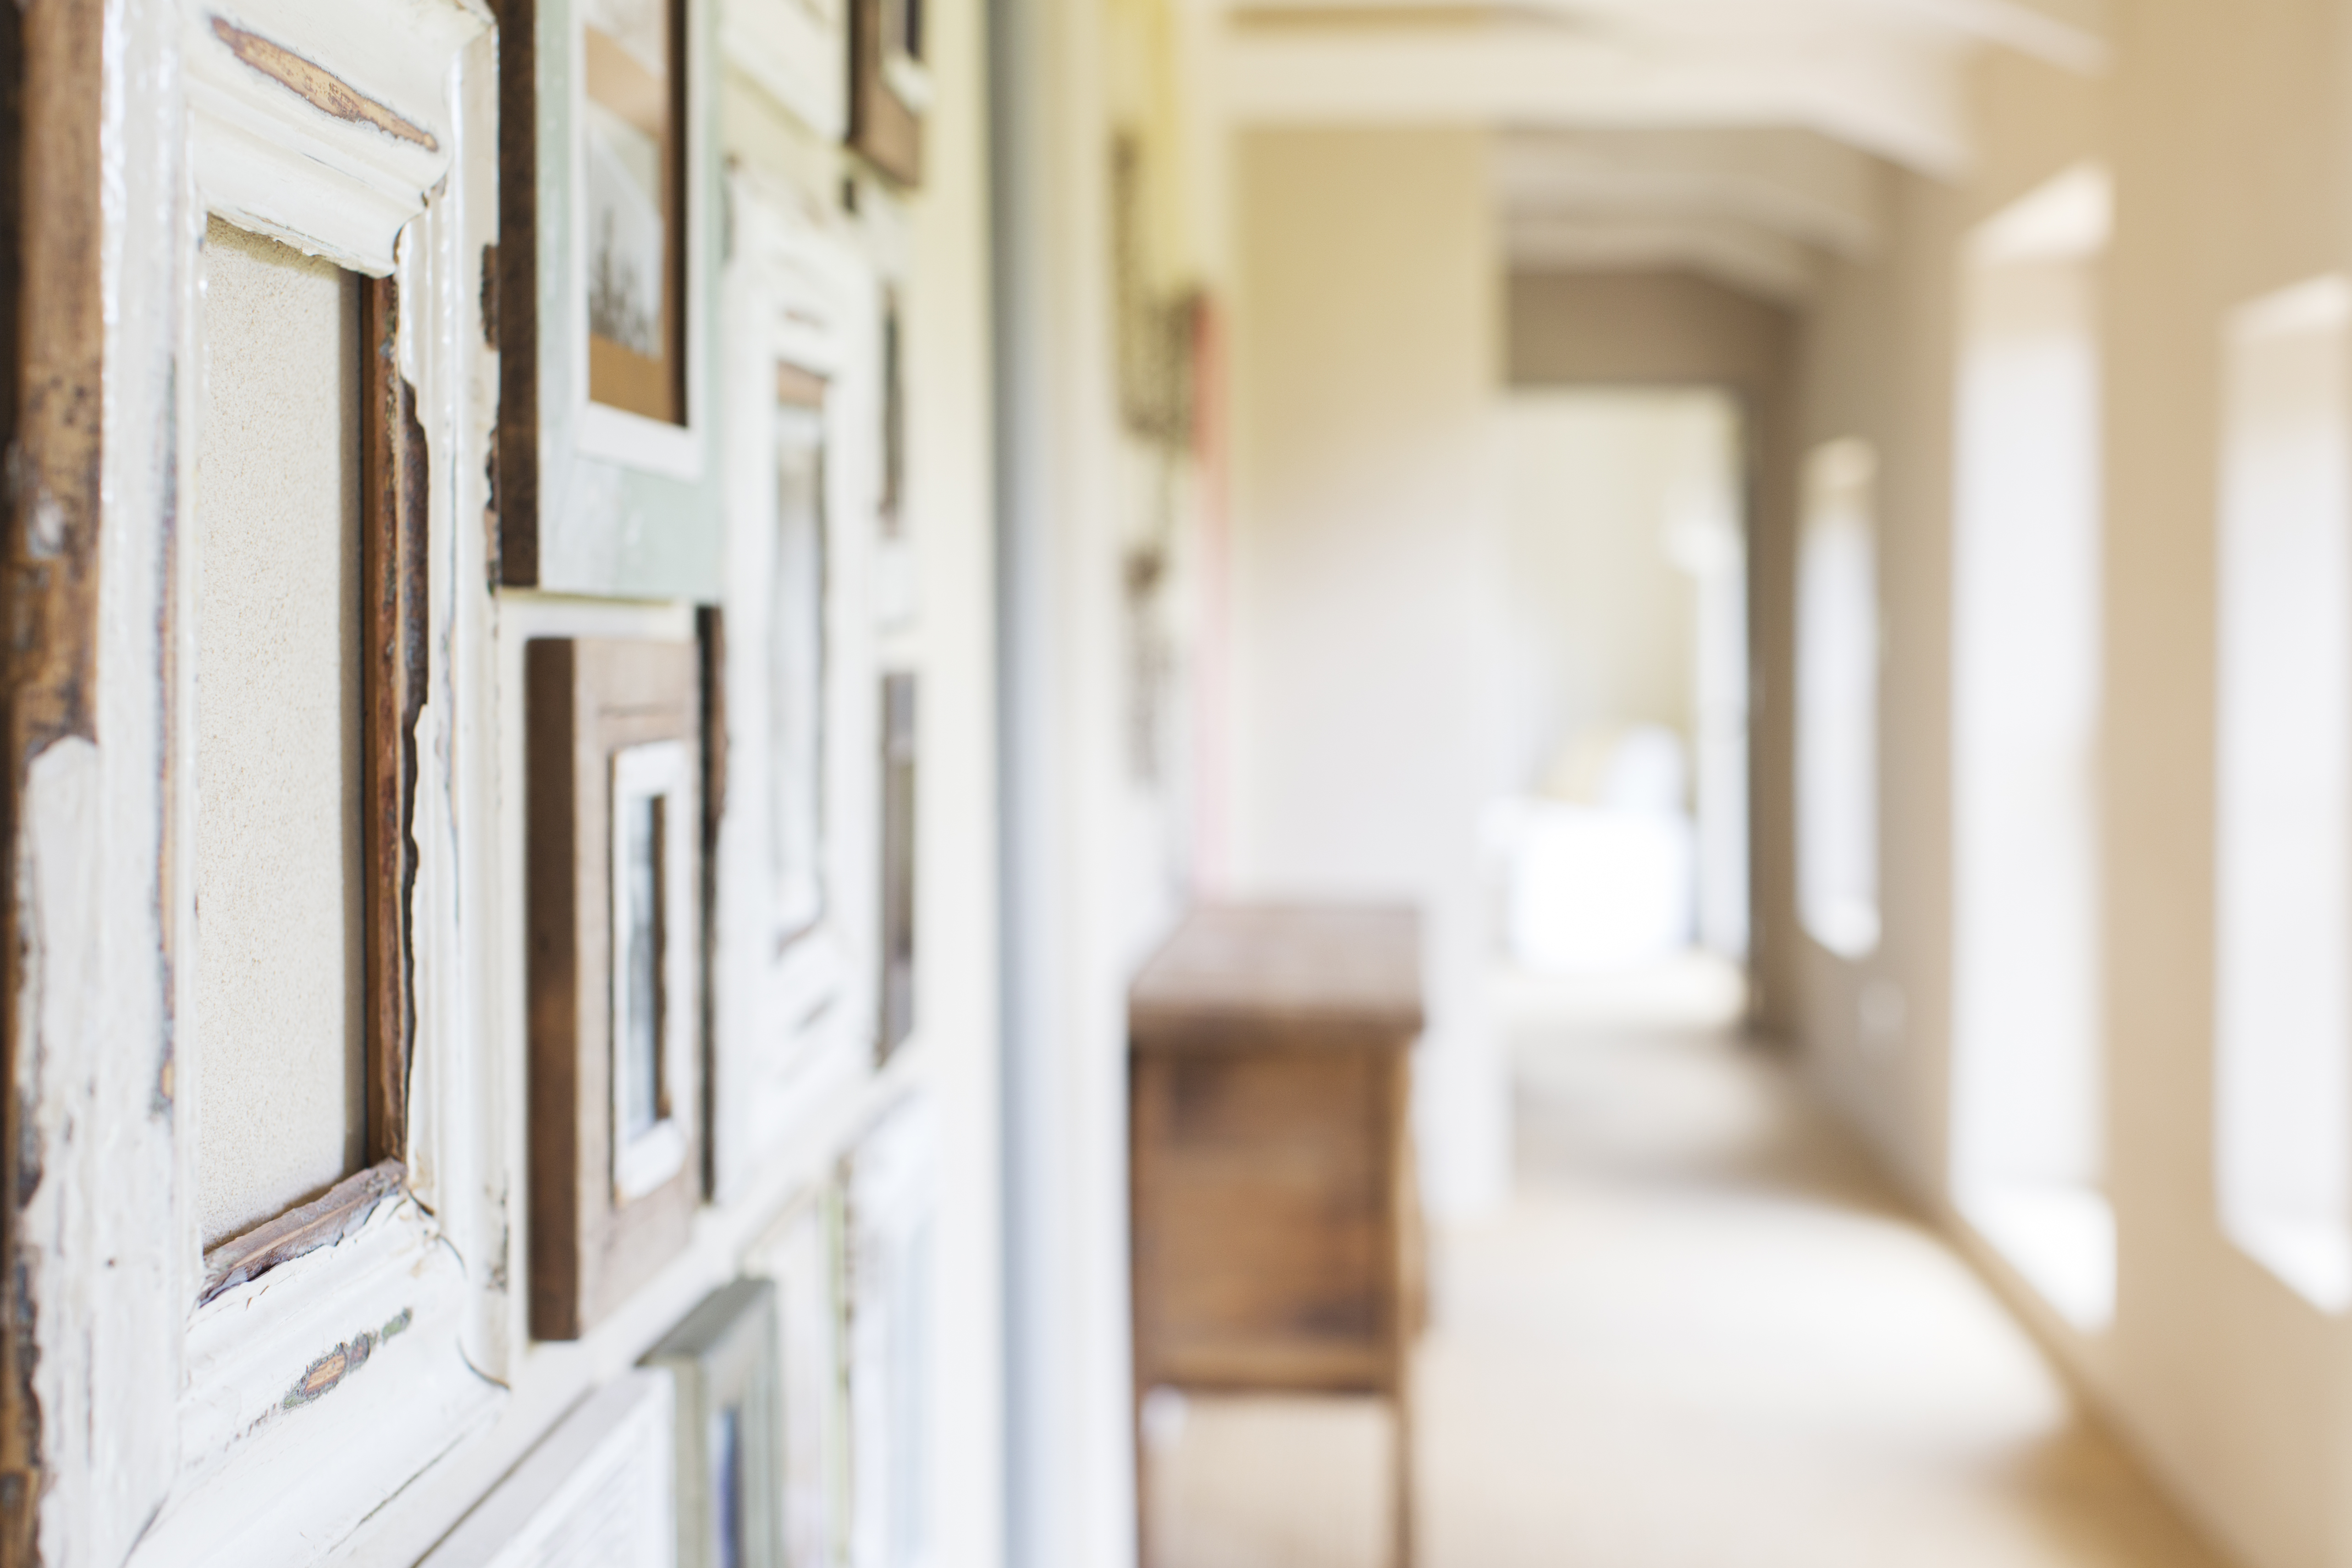 Decorative wall frames in rustic hallway